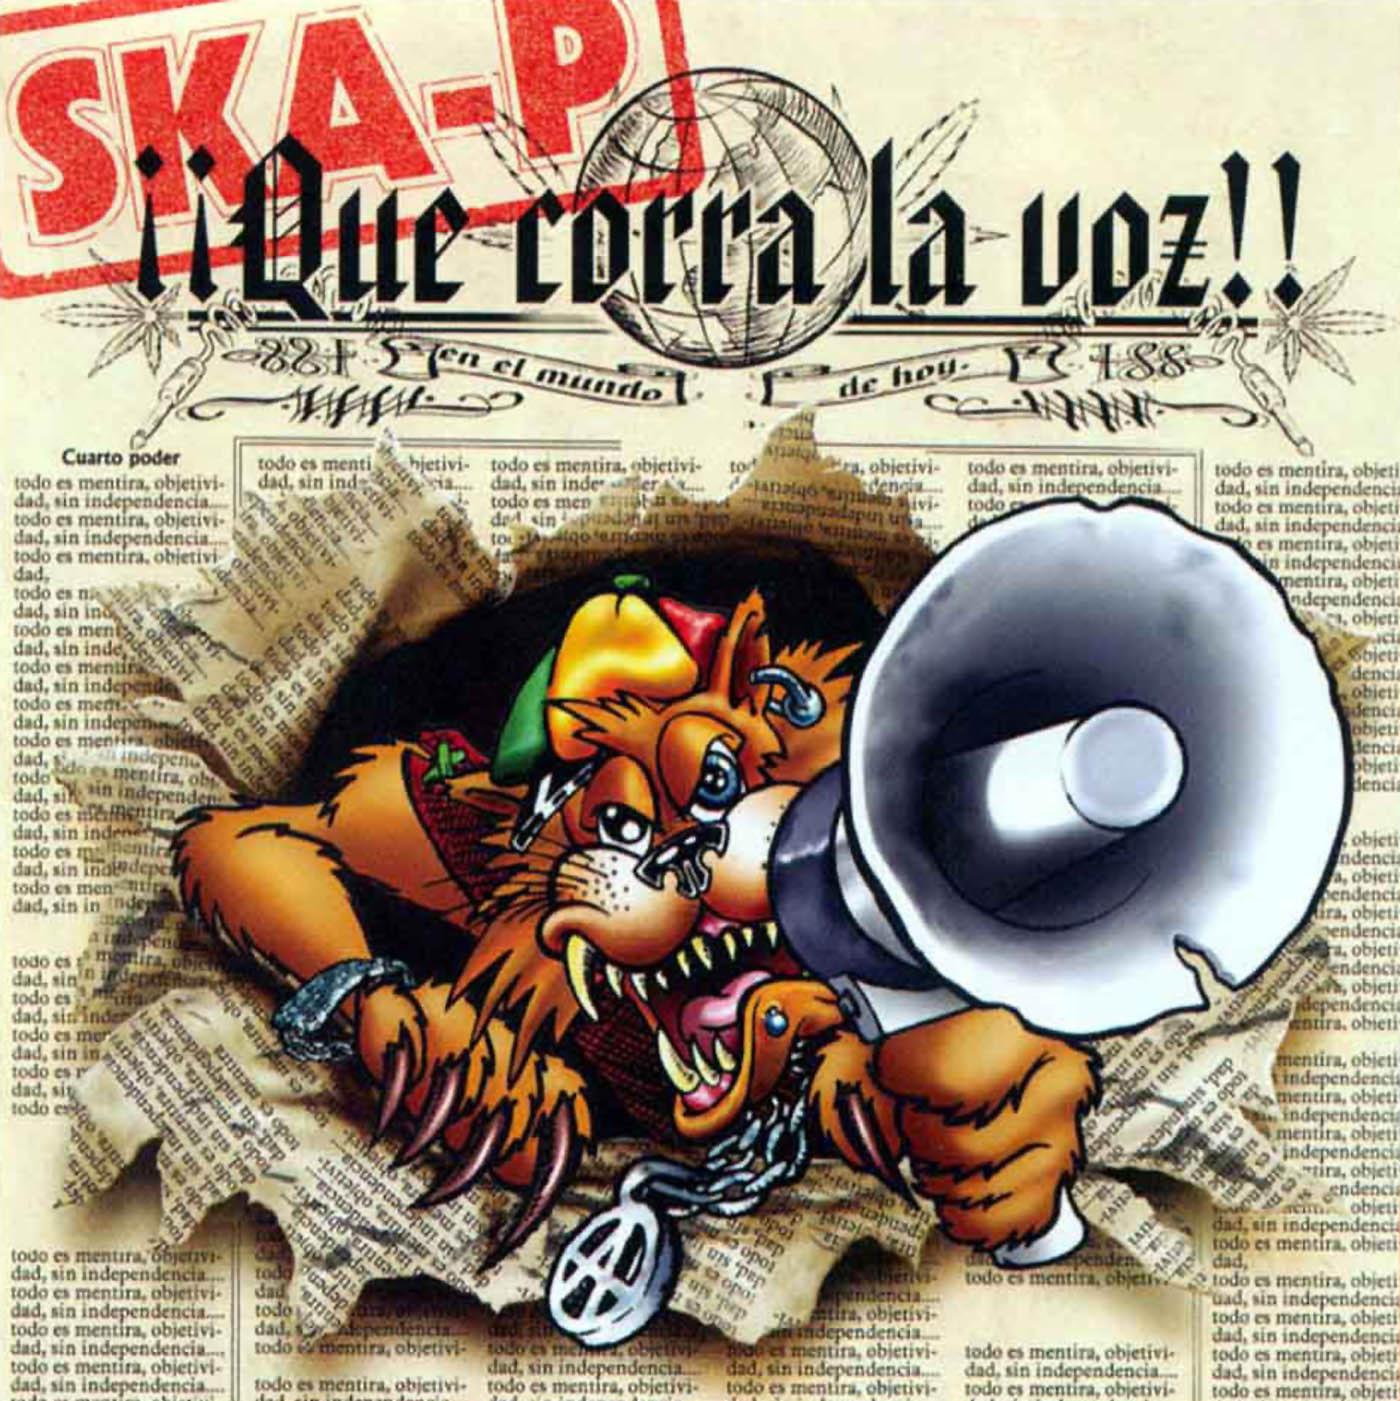 Ska-p Discografia completa Ska_P-Que_Corra_La_Voz-Frontal